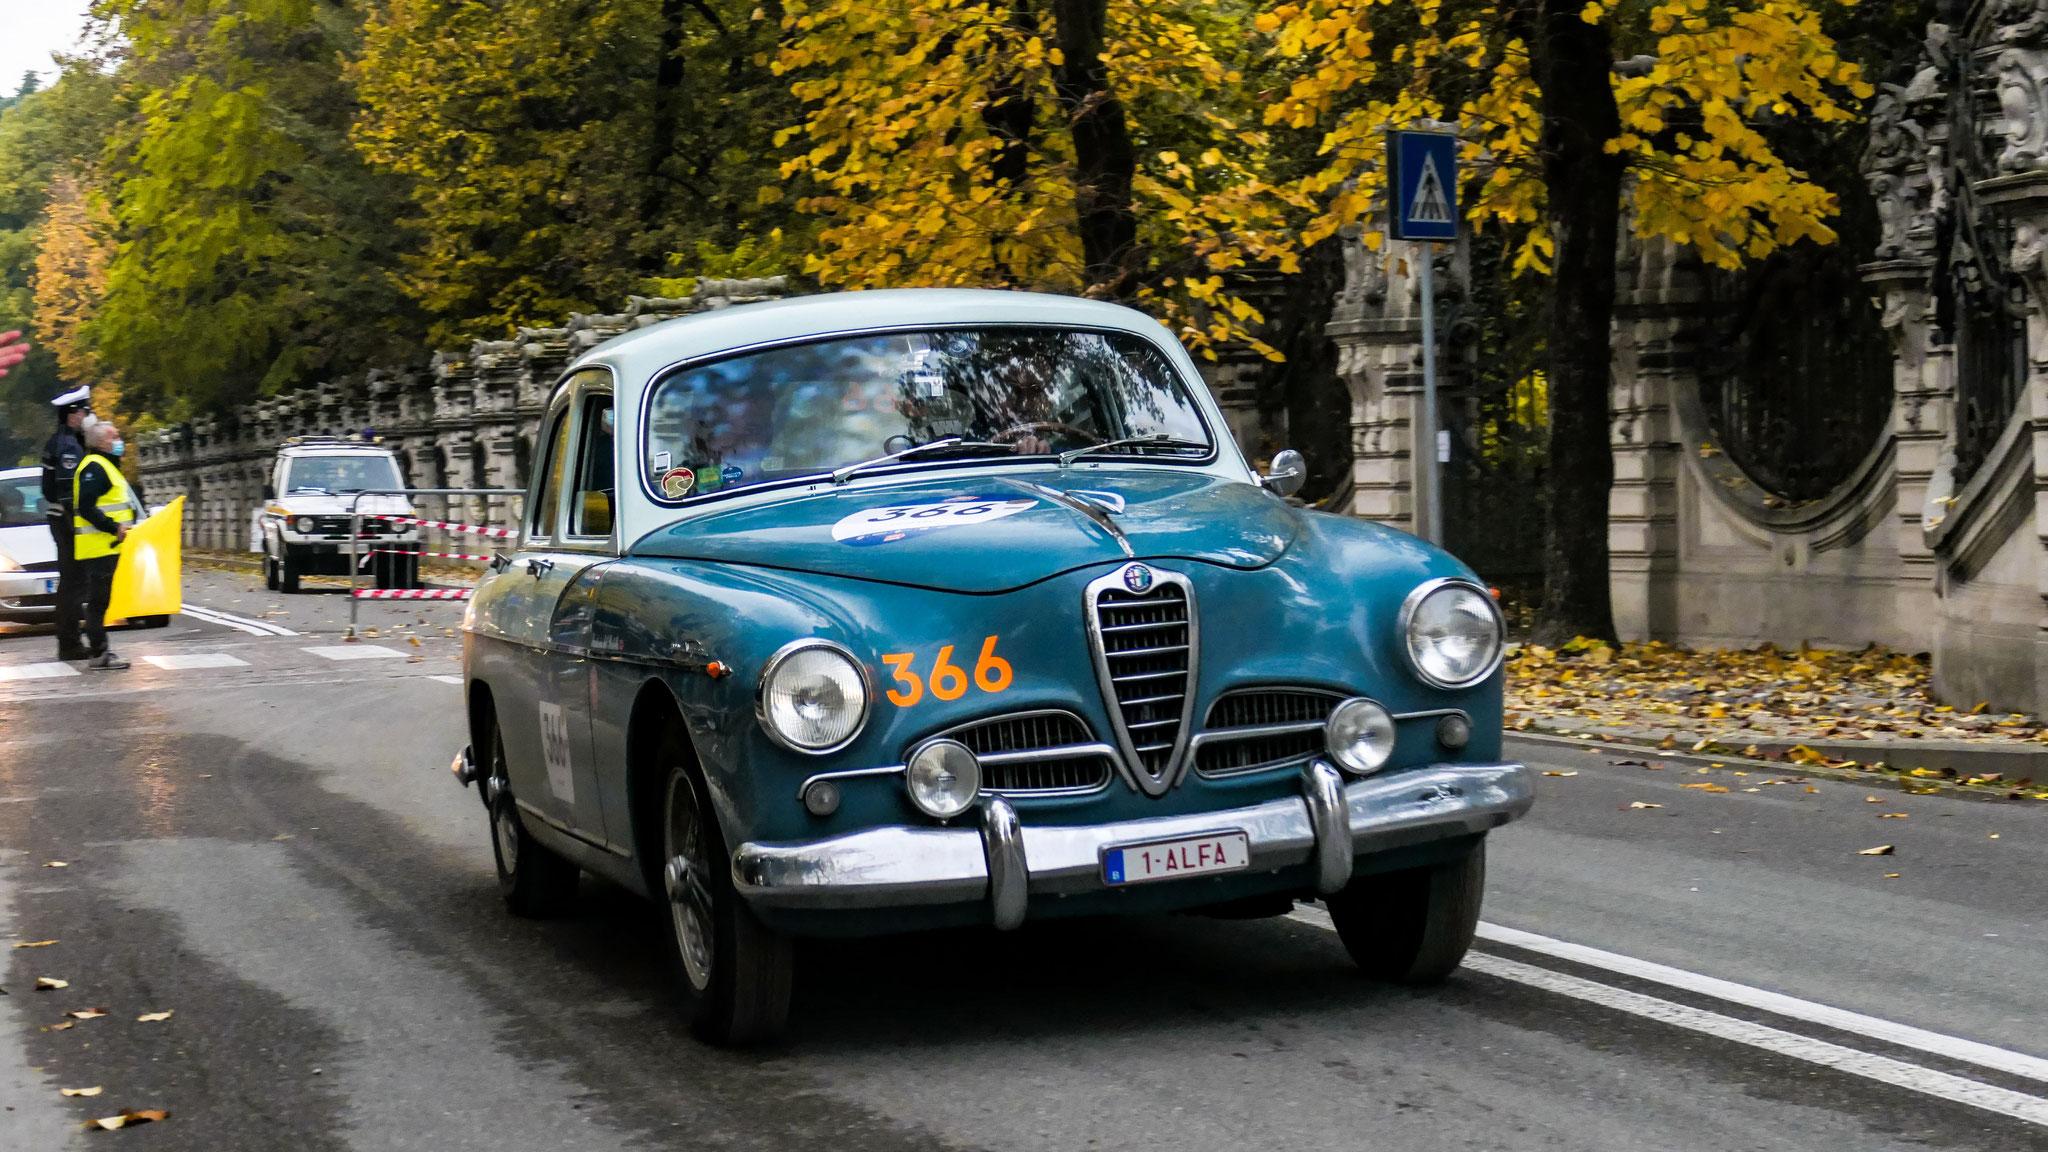 Alfa Romeo 1900 Super TI - 1-ALFA (BEL)